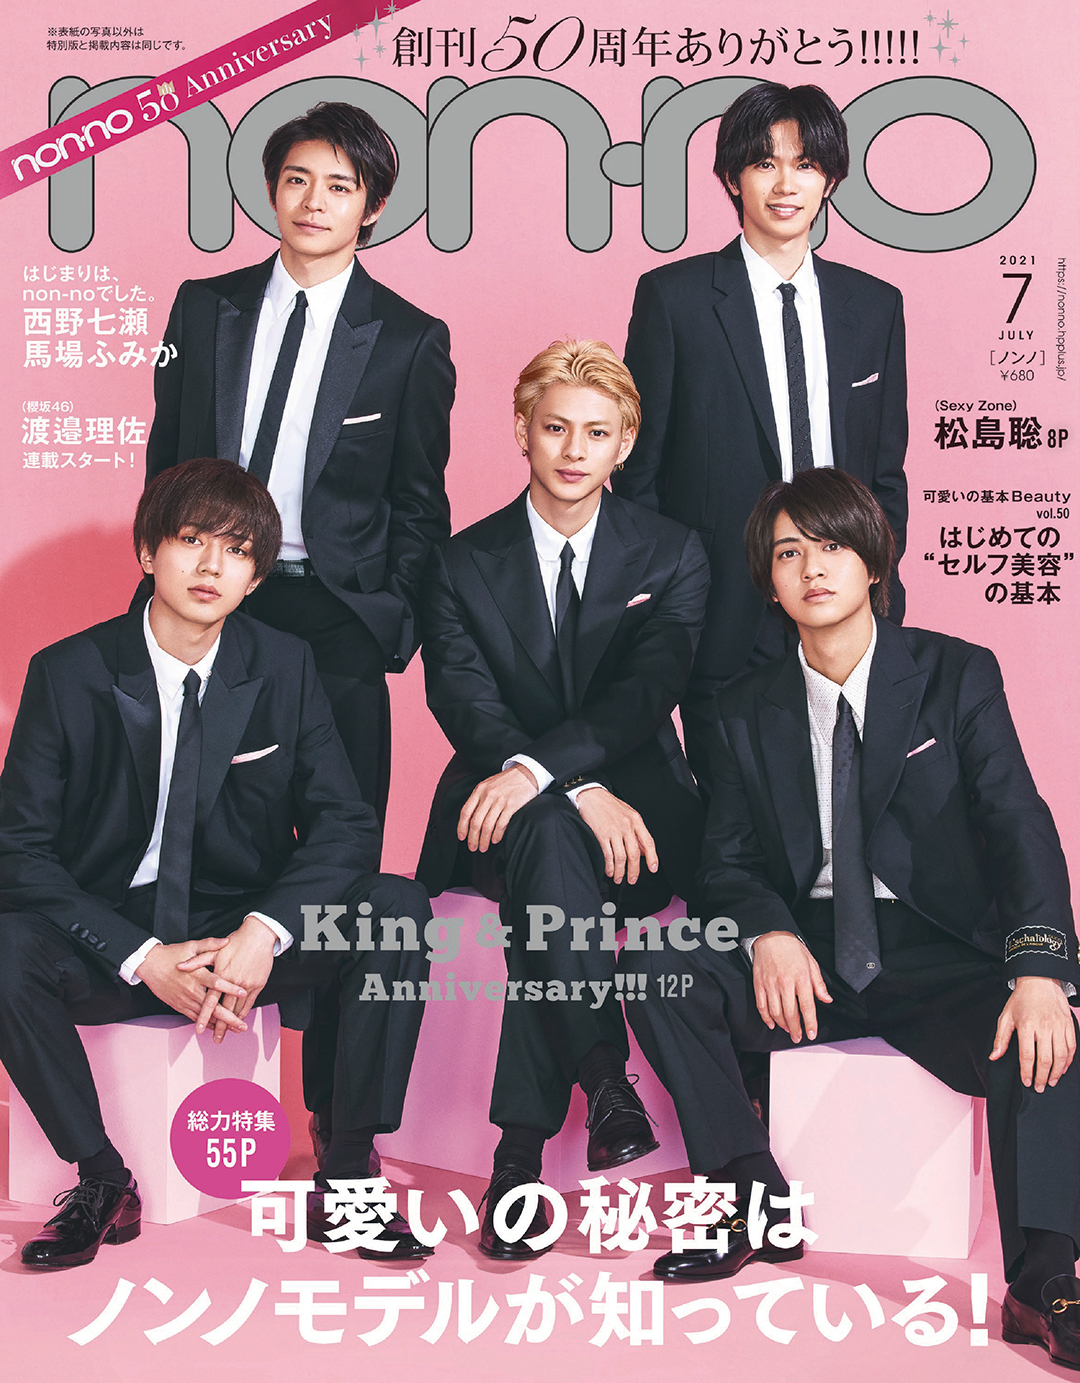 non-no2021年7月号 通常版の表紙はKing & Princeが担当!